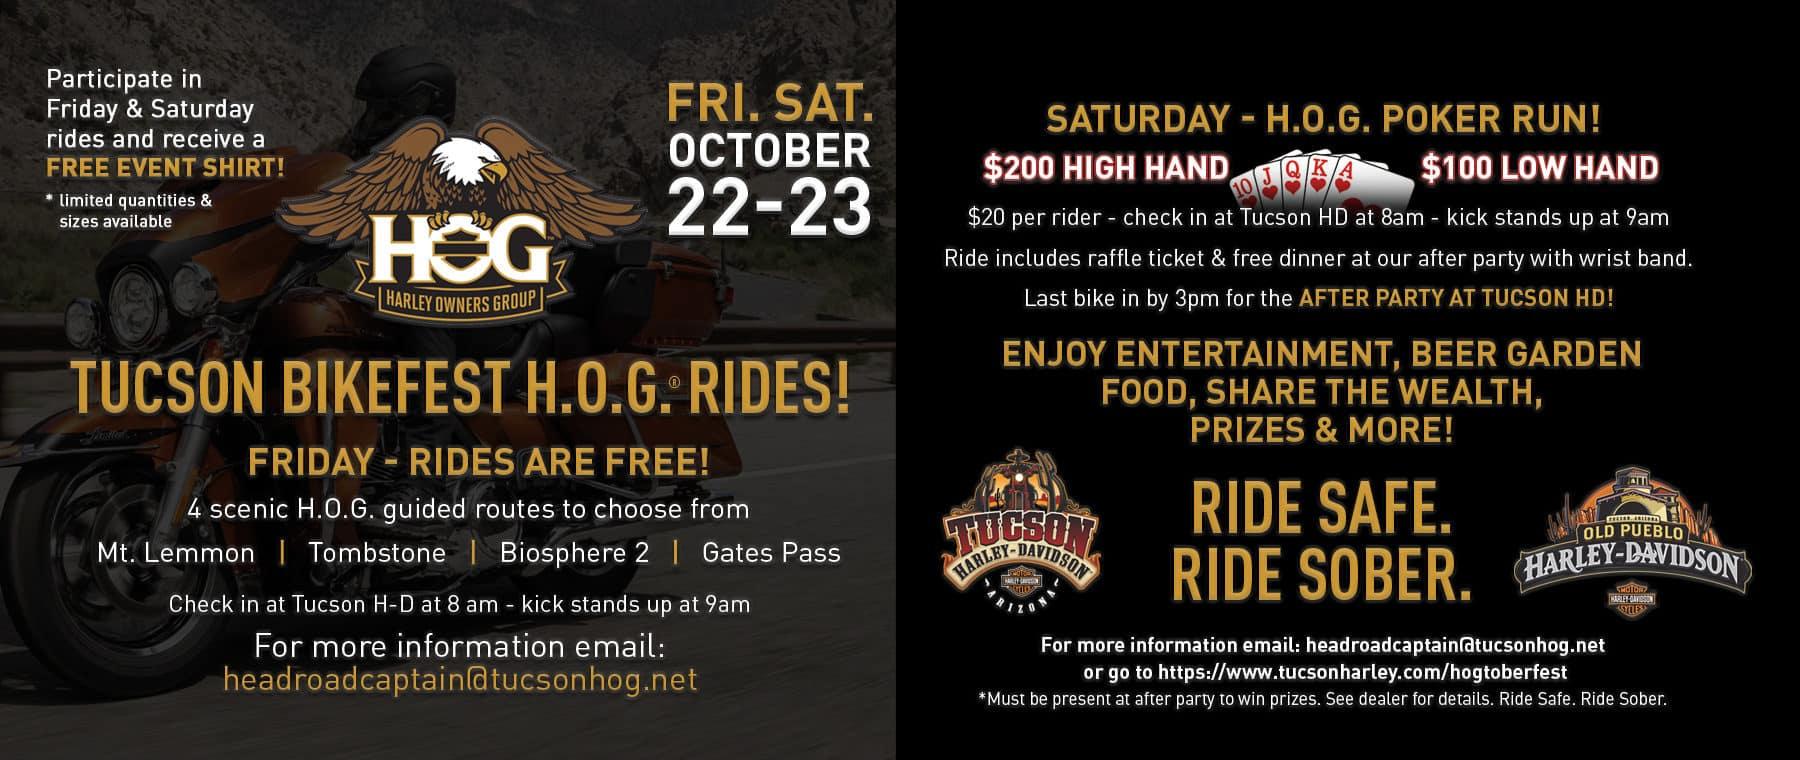 THD_Bikefest_hog_ride_rot_1800x760